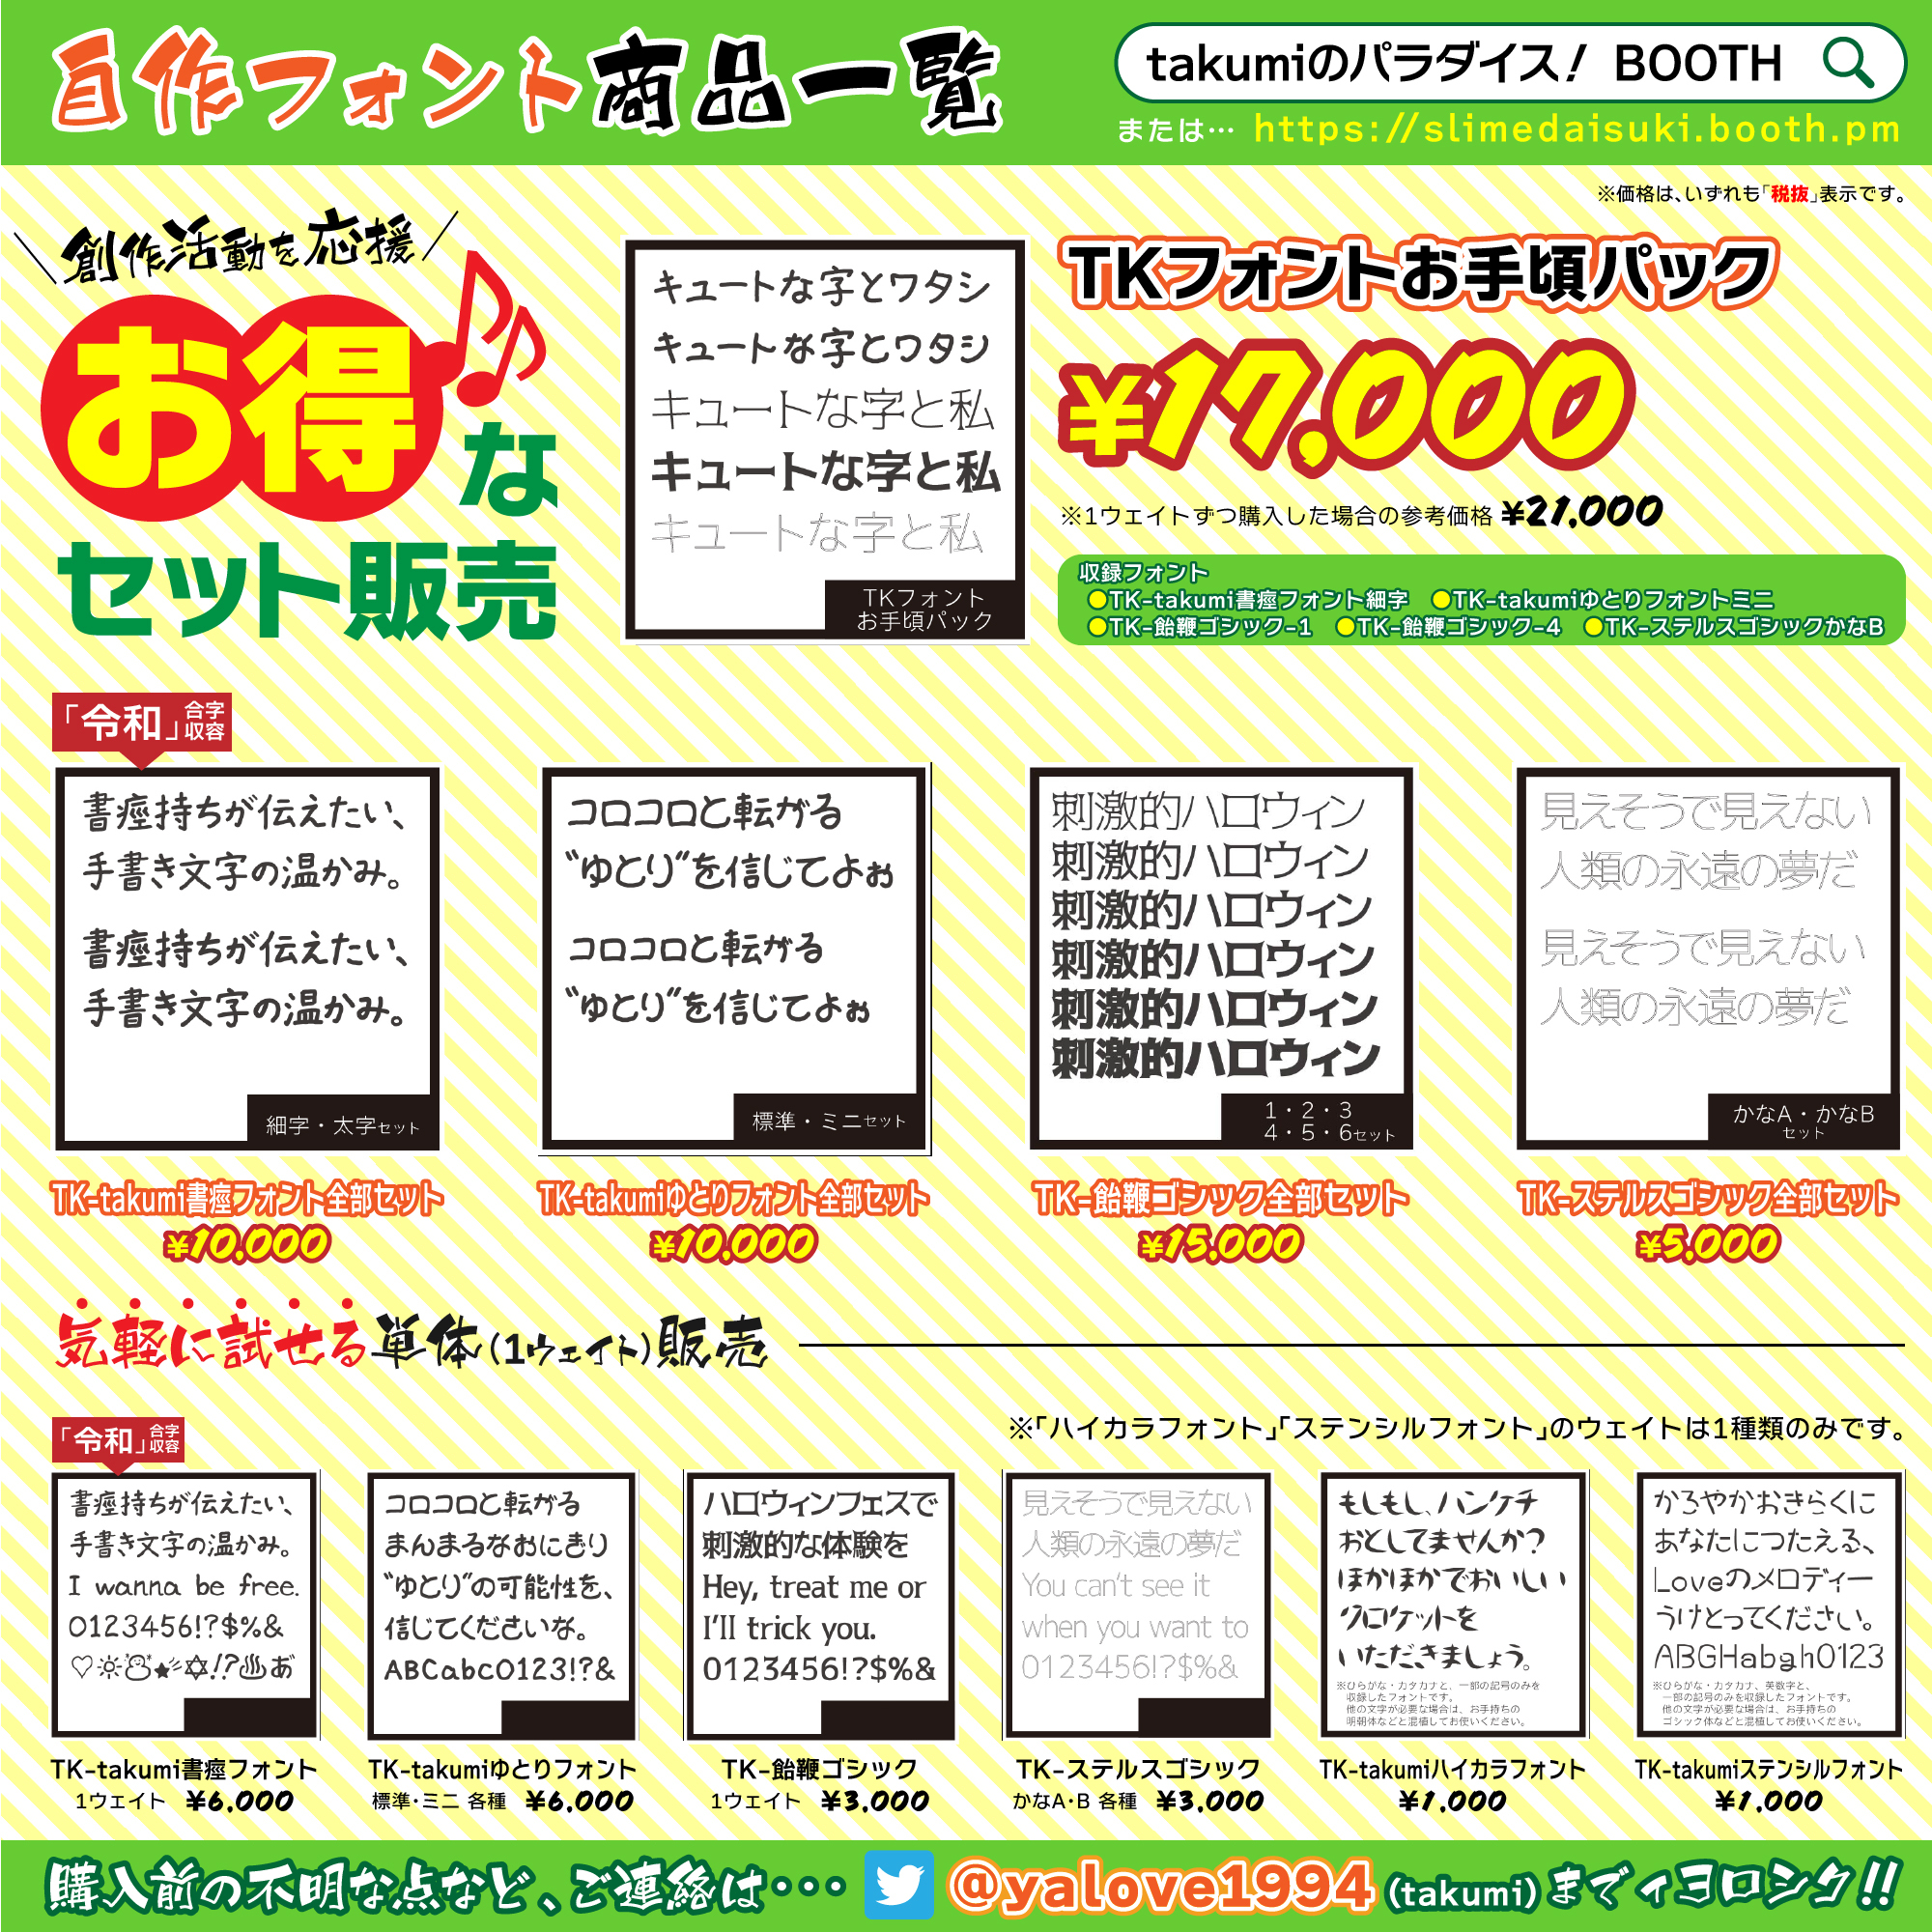 【Twitter用】BOOTH用商品サンプル